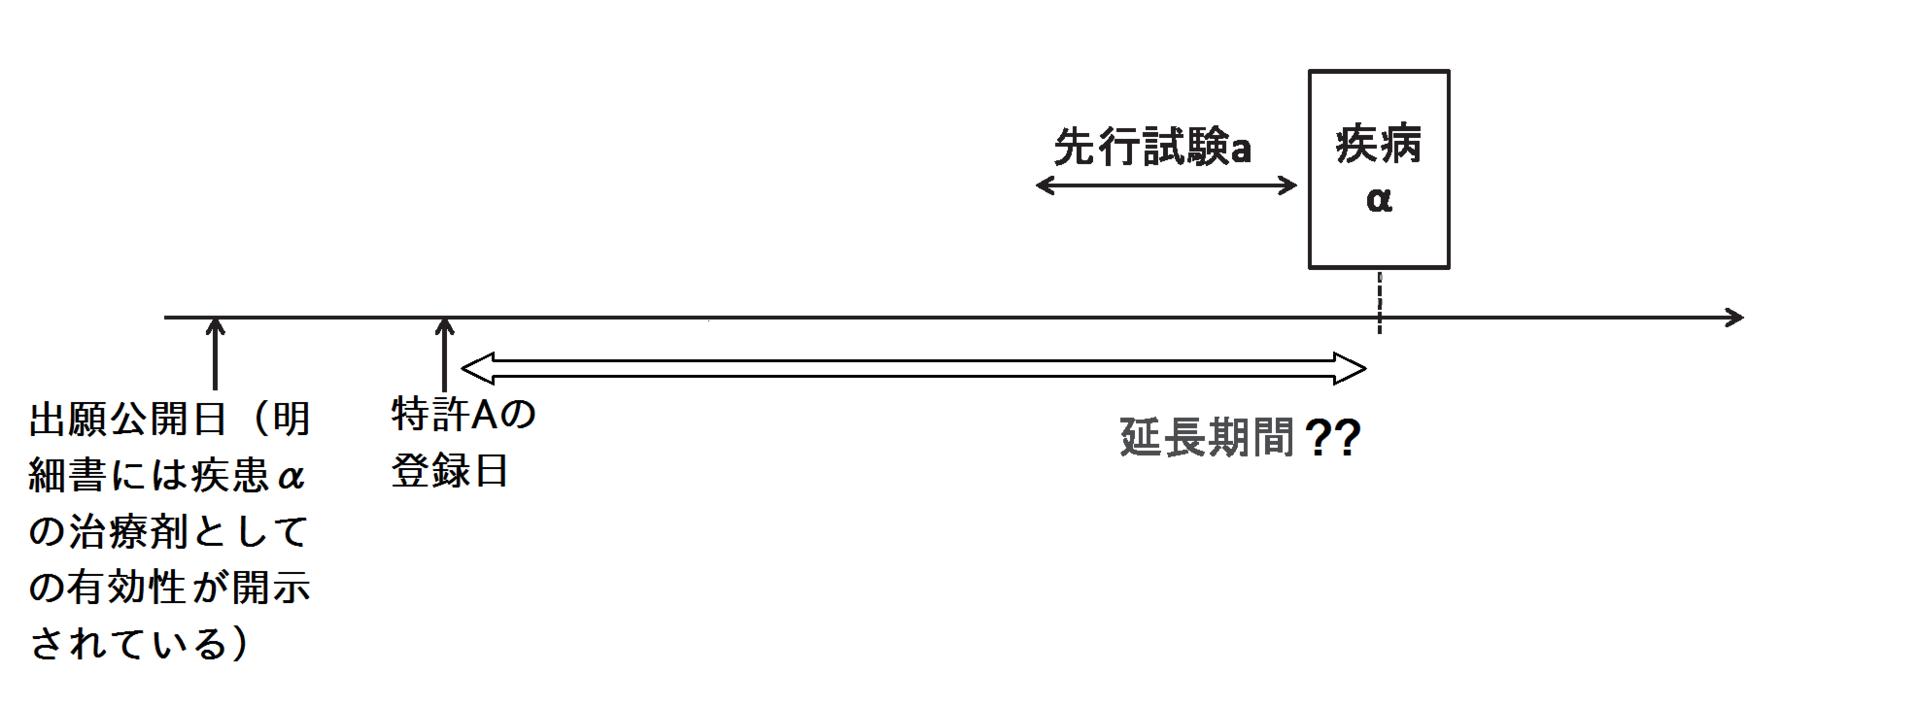 2020shimizu_fig20r改02.png